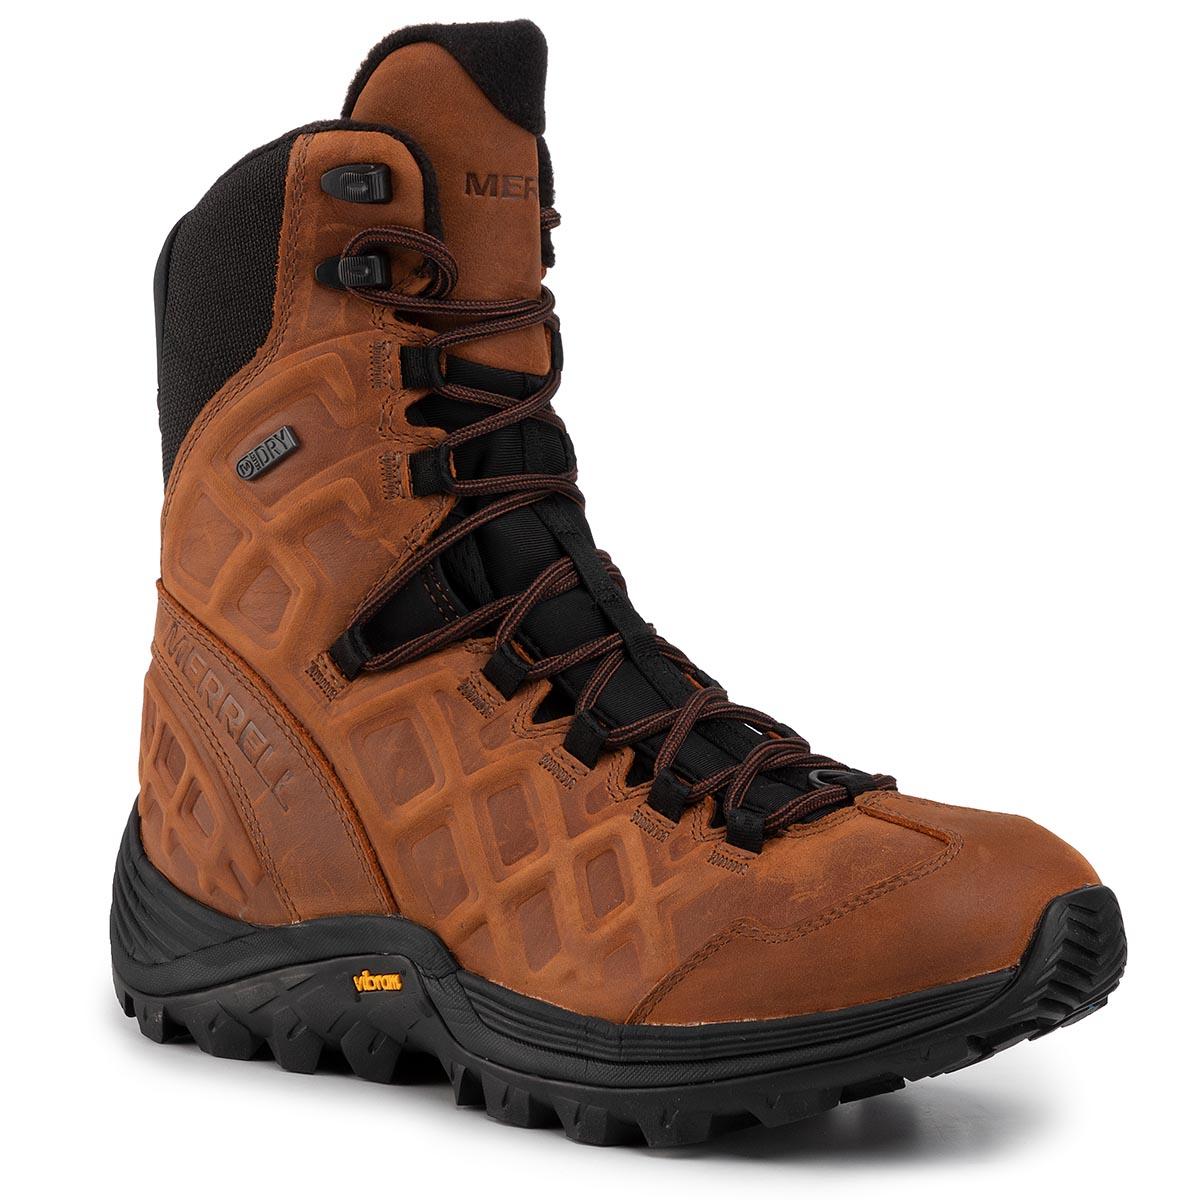 Trekingová obuv MERRELL - Thermo Rogue 8 Ltr Wp Ice J33621 Merrell Oak